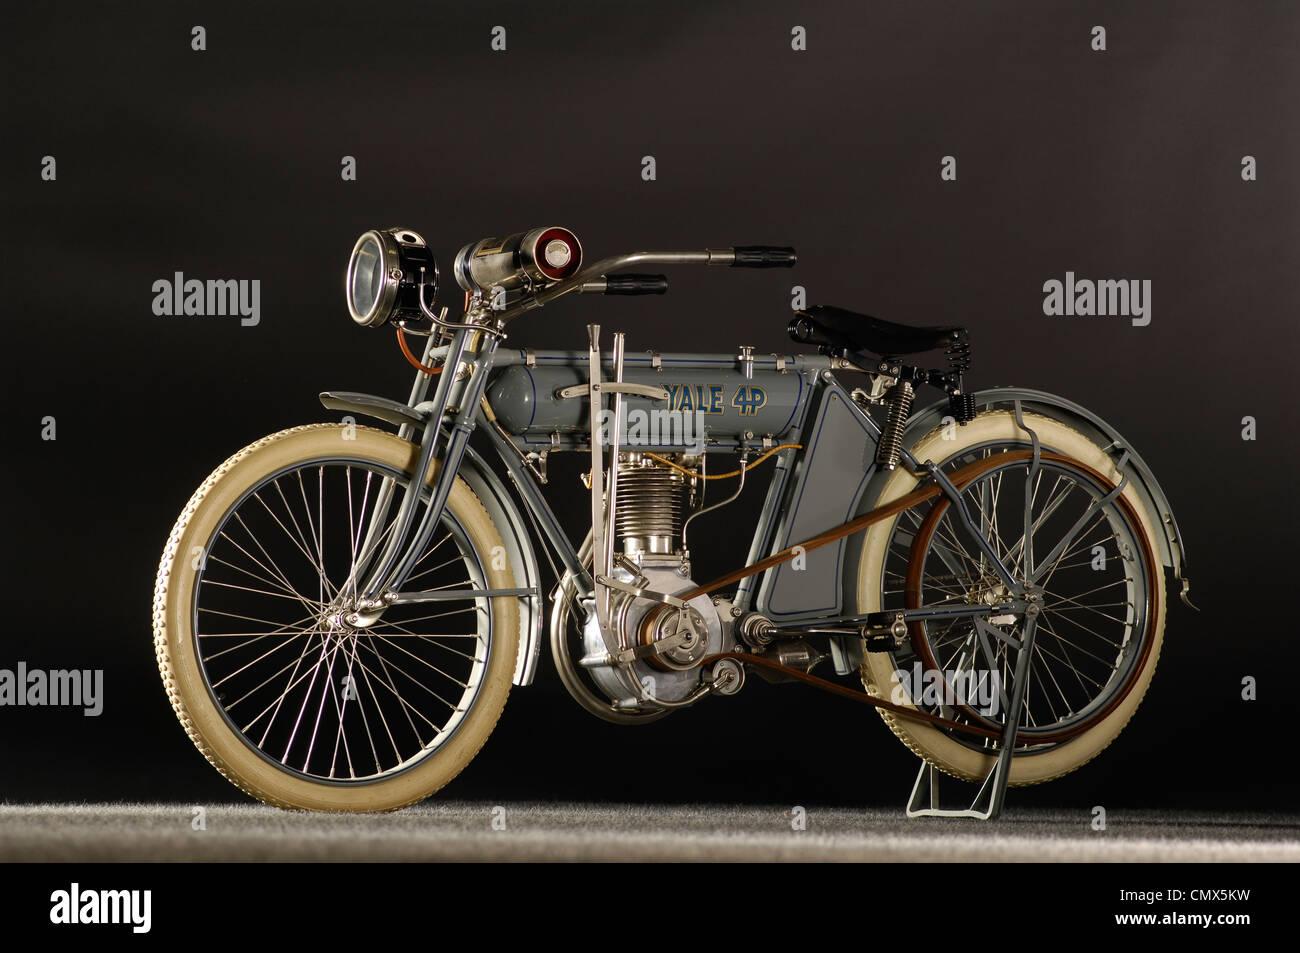 1912 Yale 4hp motocicleta Foto de stock